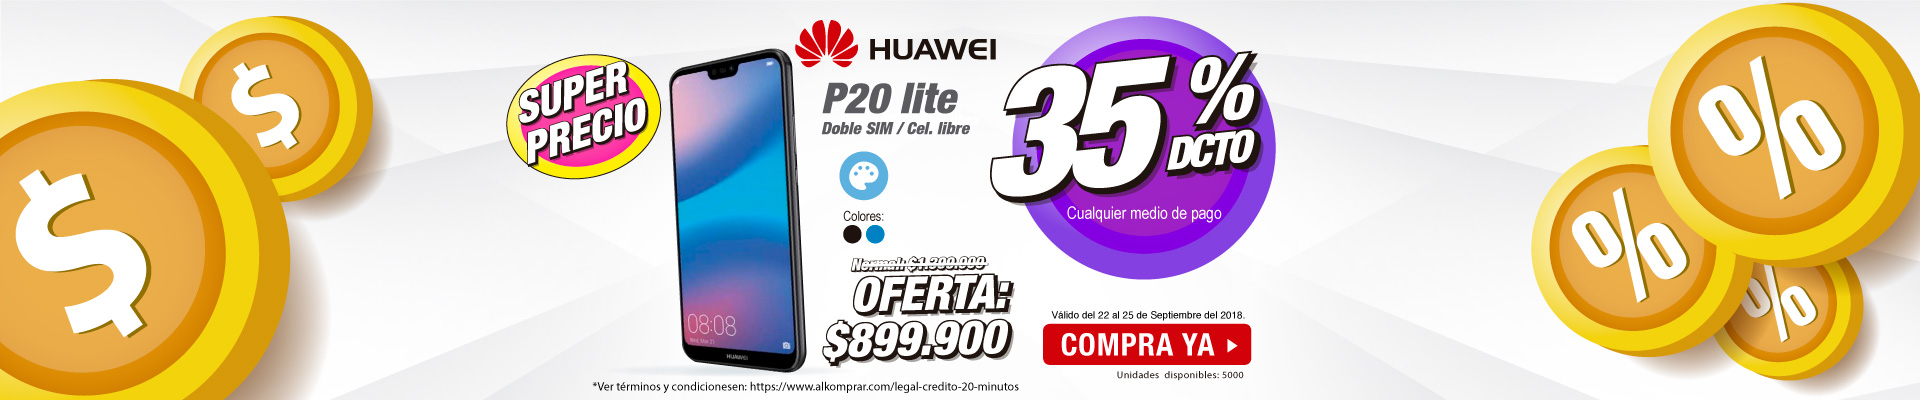 Banner ppal - Huawei P20 lite